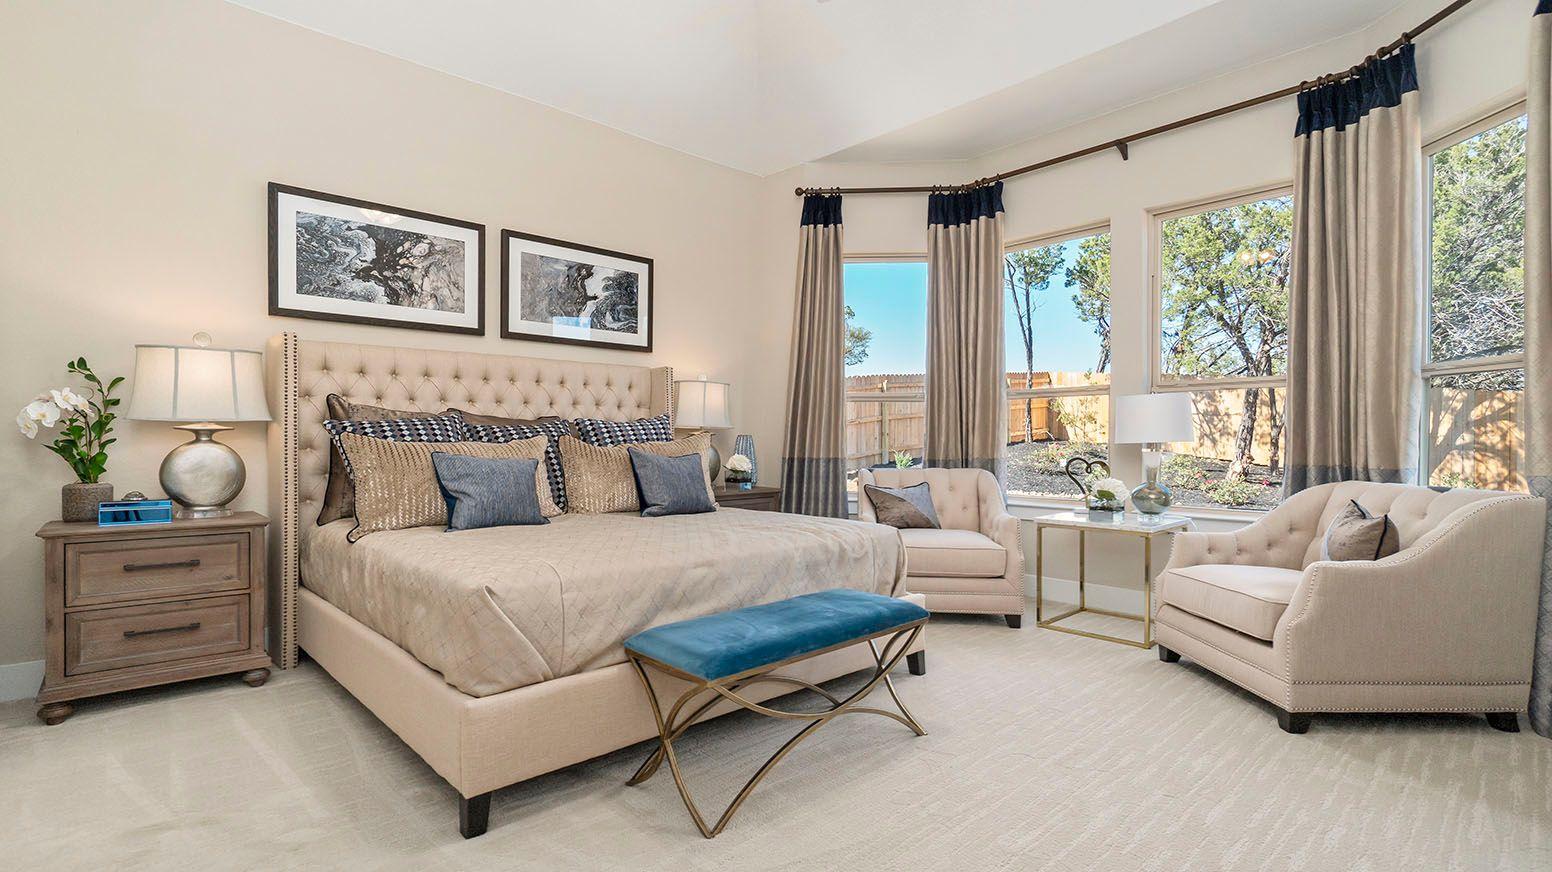 Bedroom featured in the San Saba By Empire Communities in San Antonio, TX